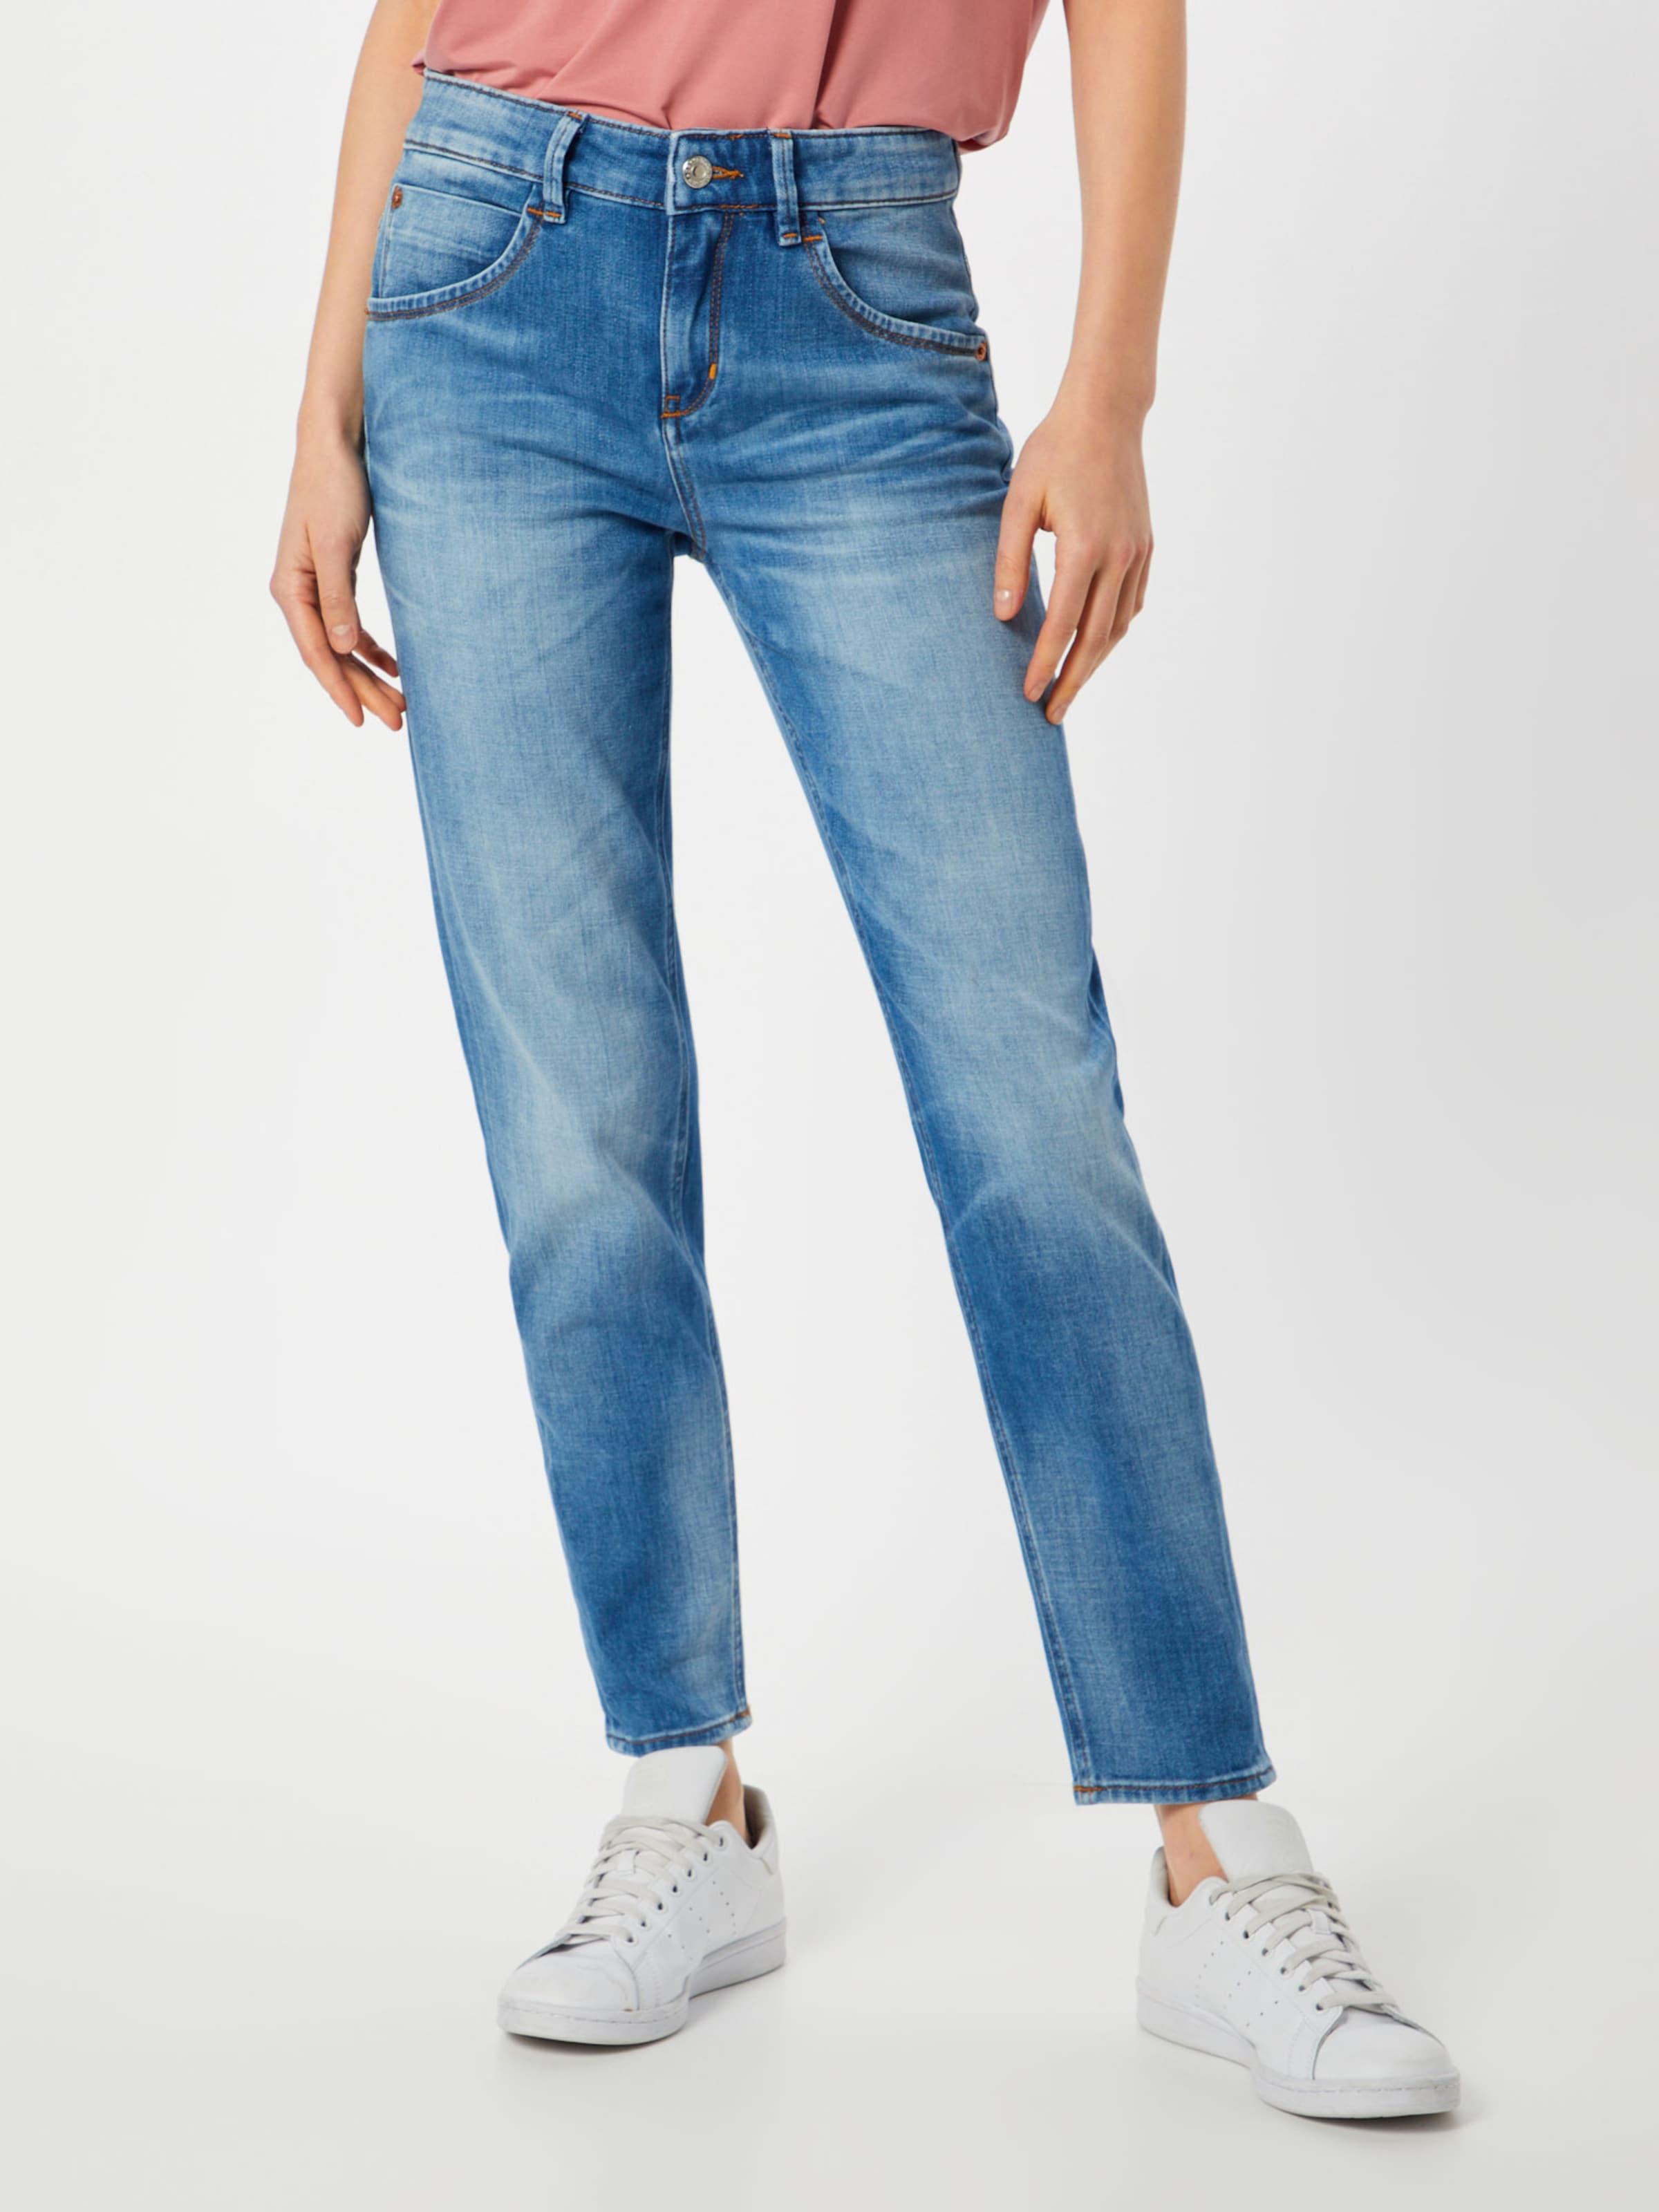 'like' Drykorn In Blue Denim Jeans tshrdCQ